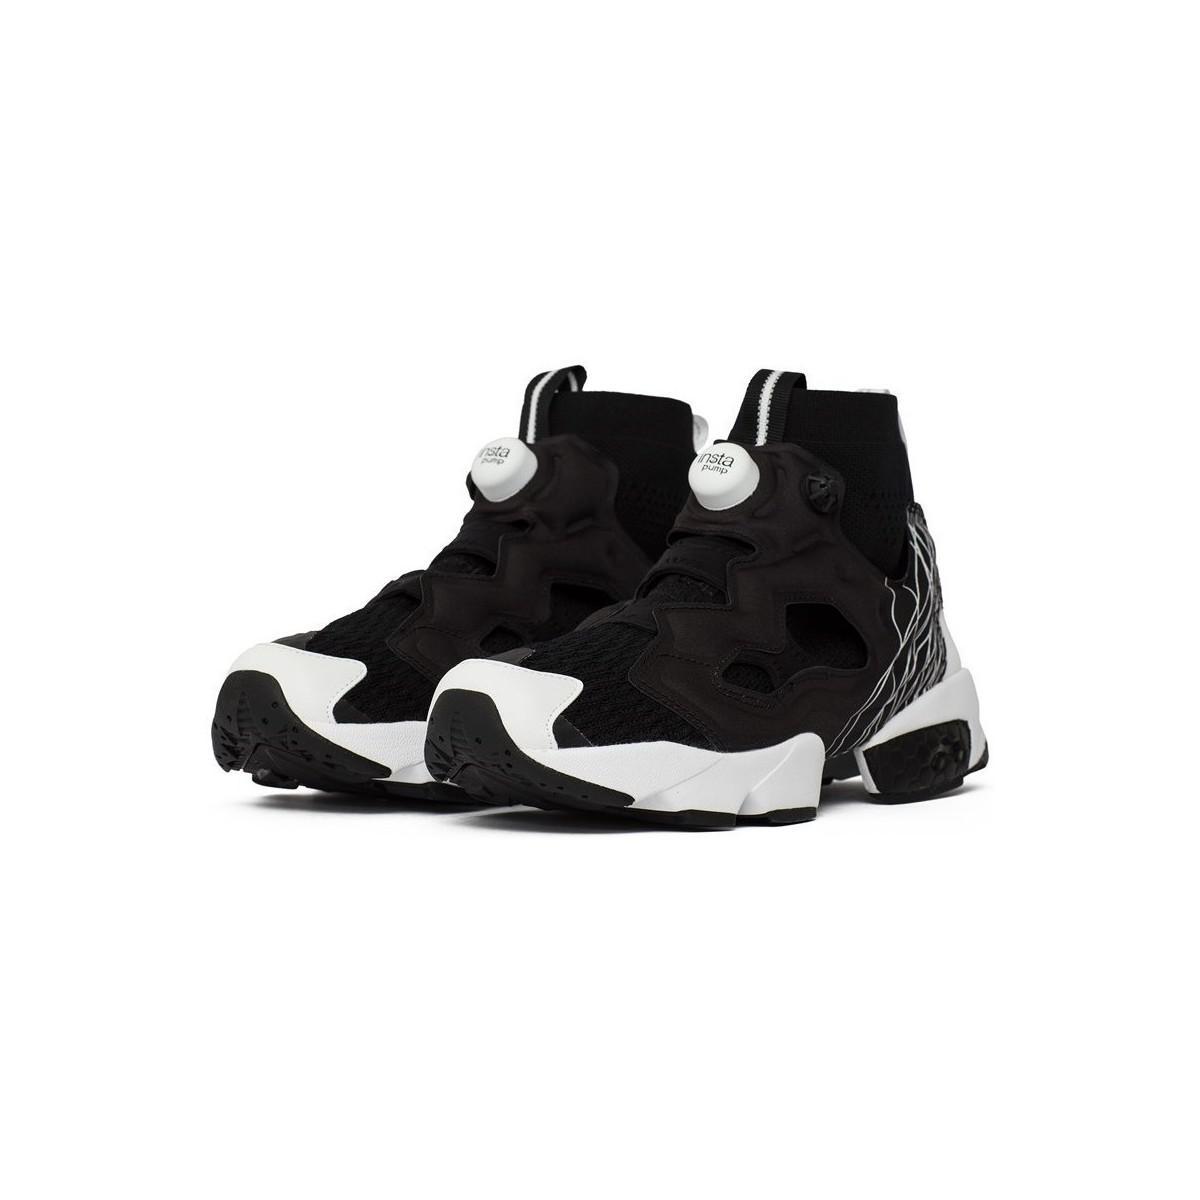 Reebok Instapump Fury Og Ultraknit Men's Shoes (high-top Trainers) In Black for Men